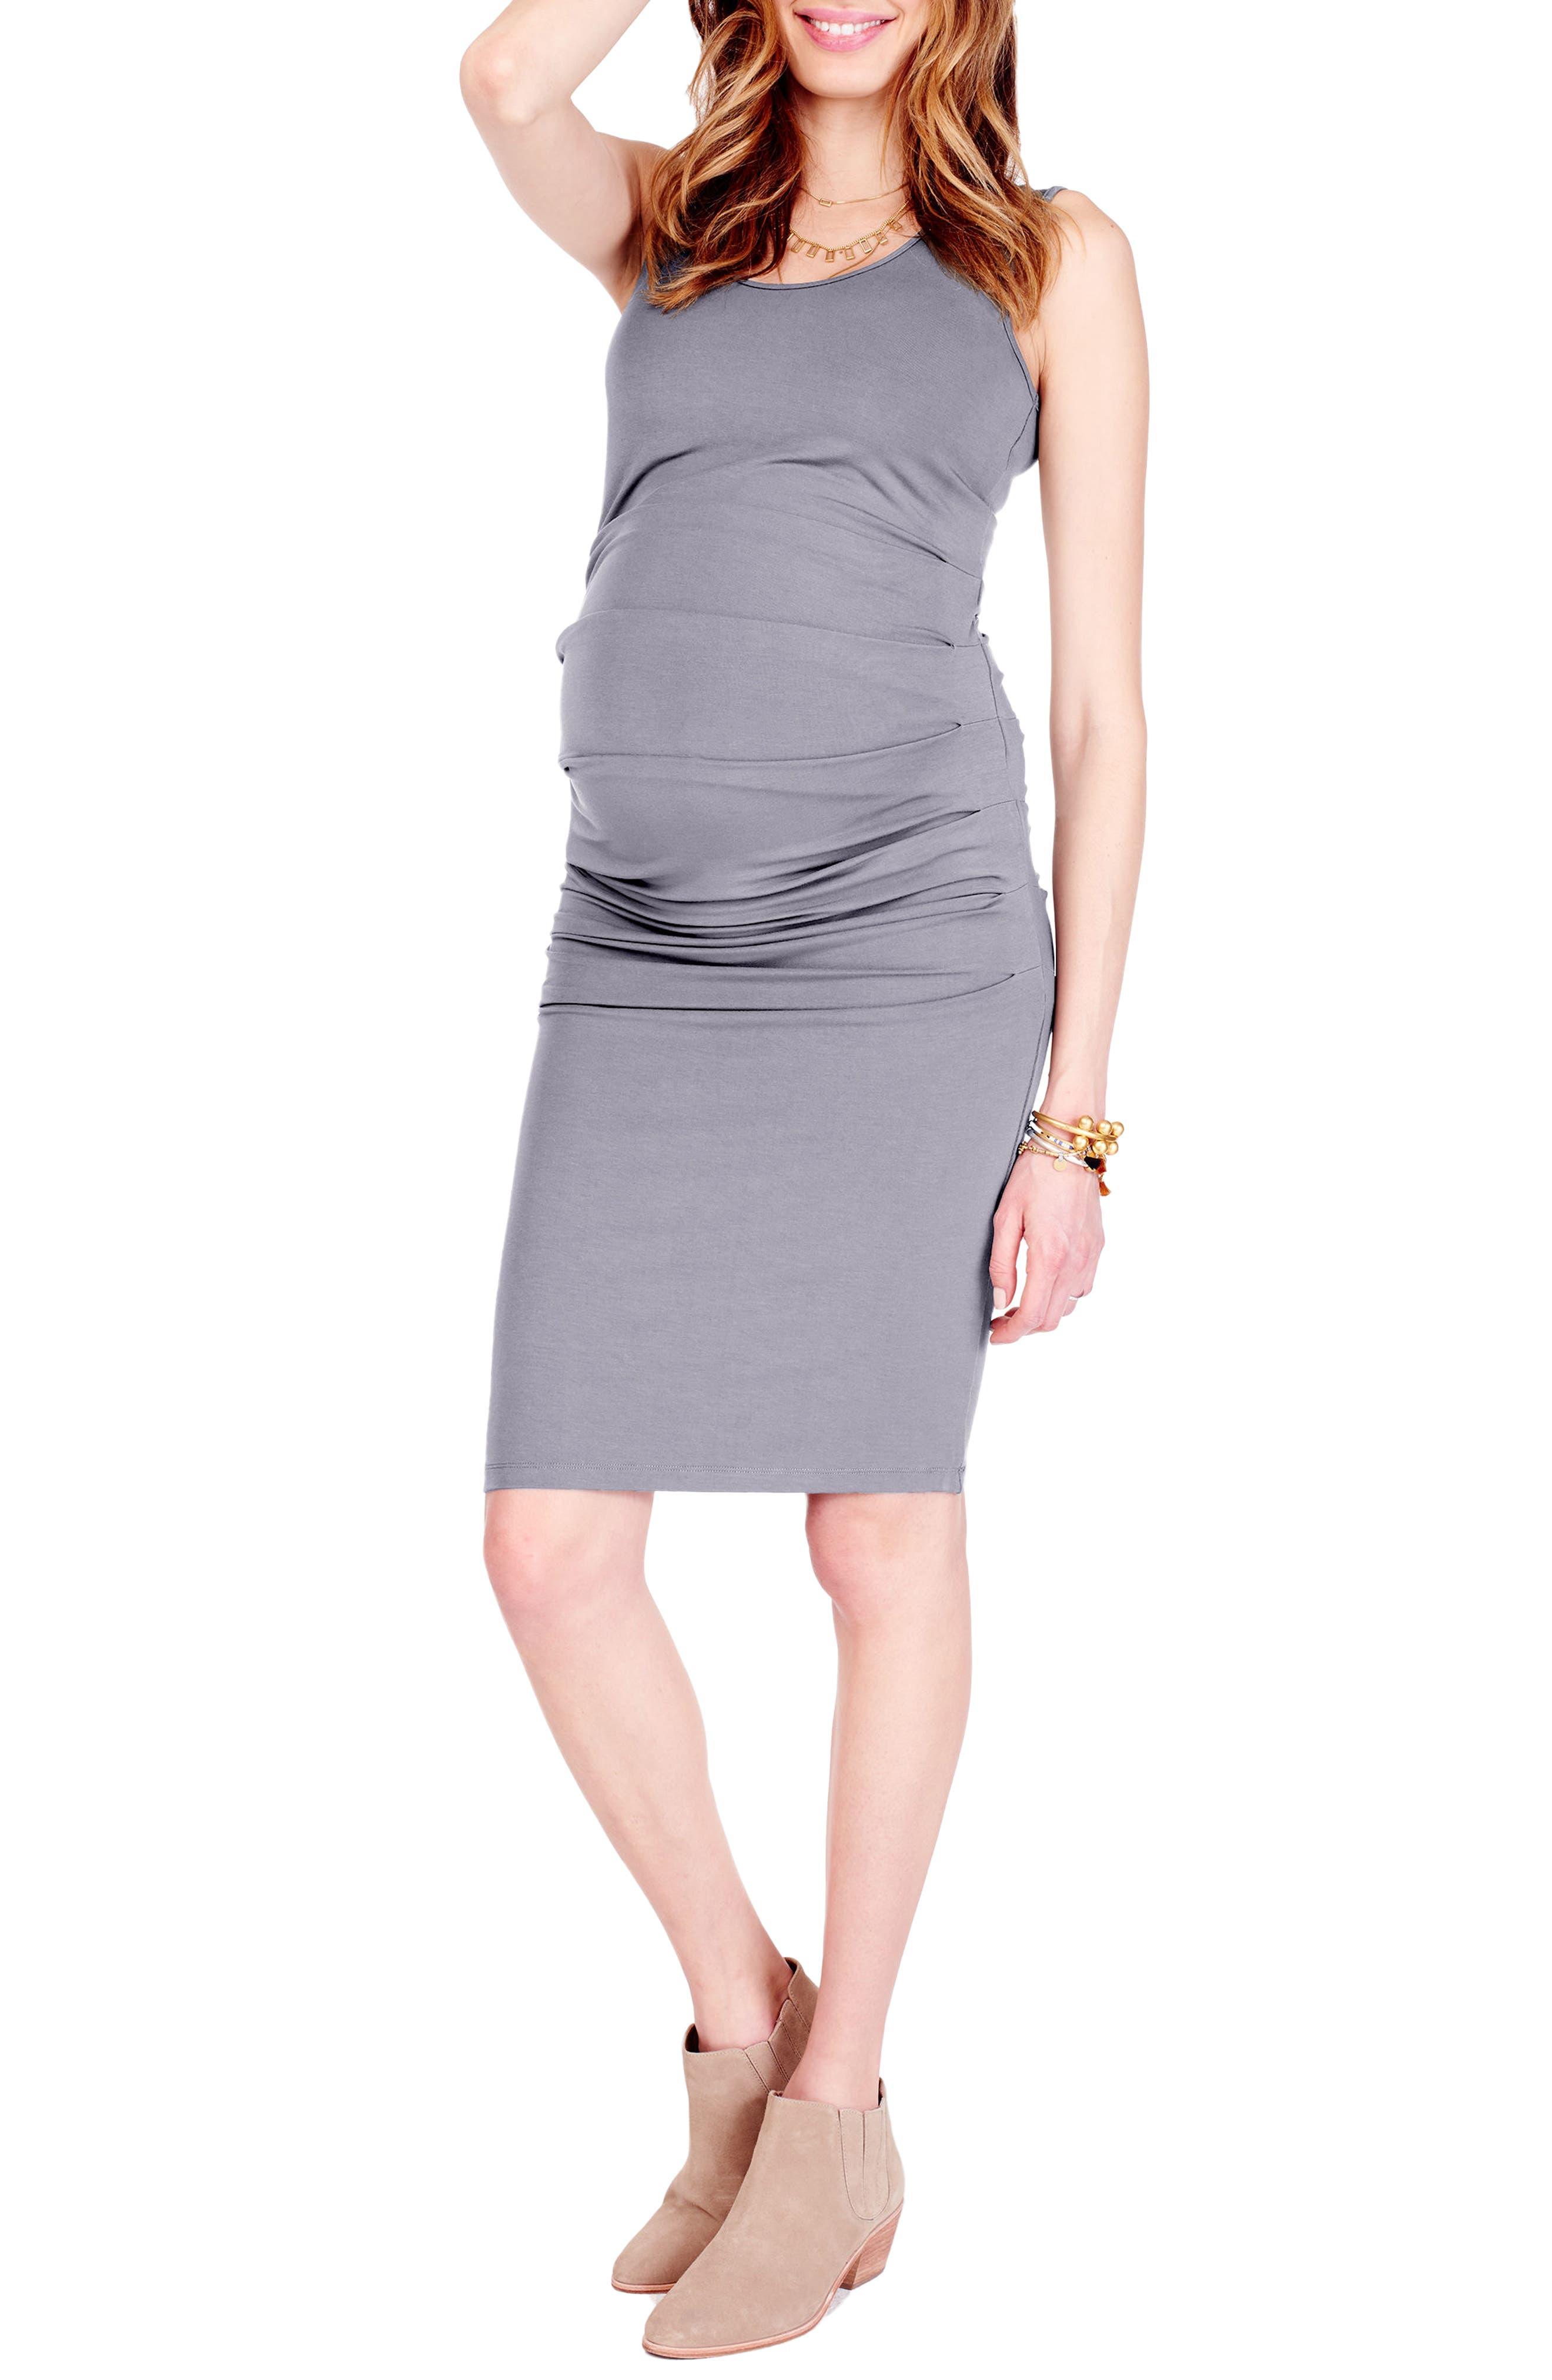 Nordstrom Maternity Cocktail Dresses